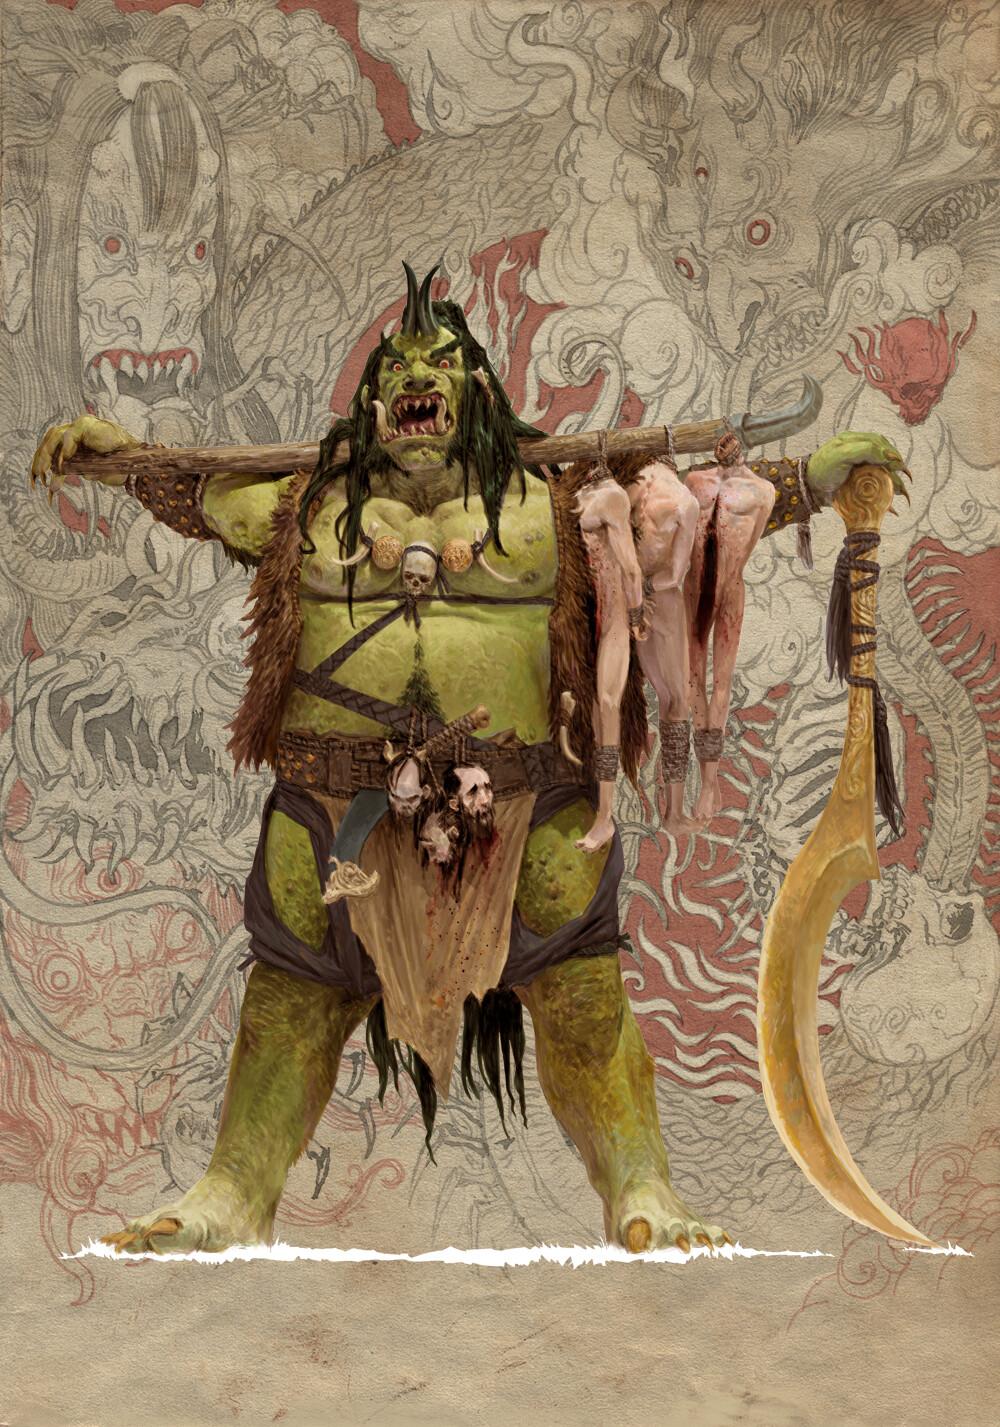 Adrian smith monster demon oni 1